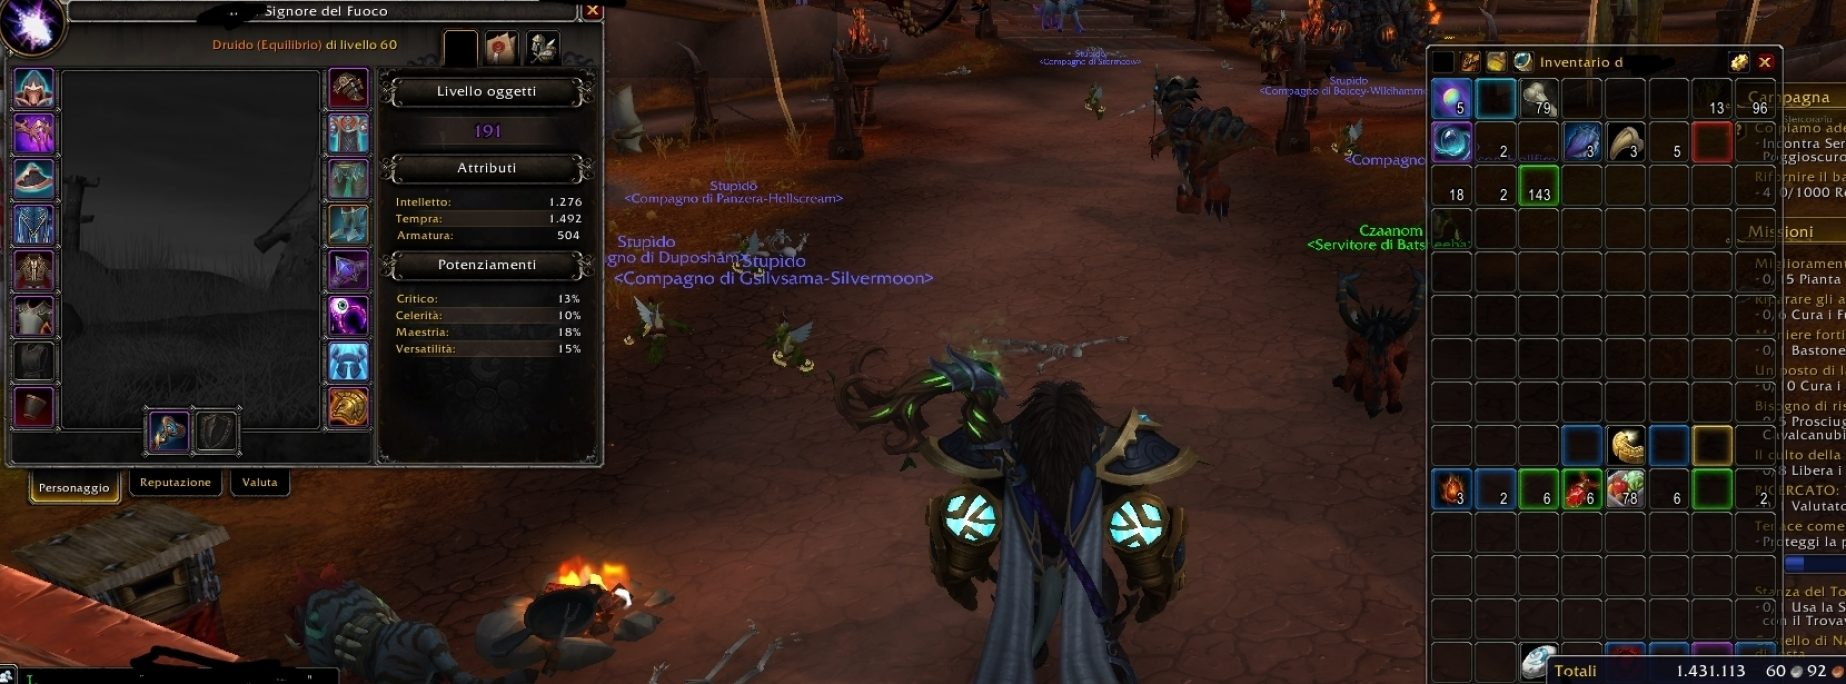 Tauren male druid pozzo